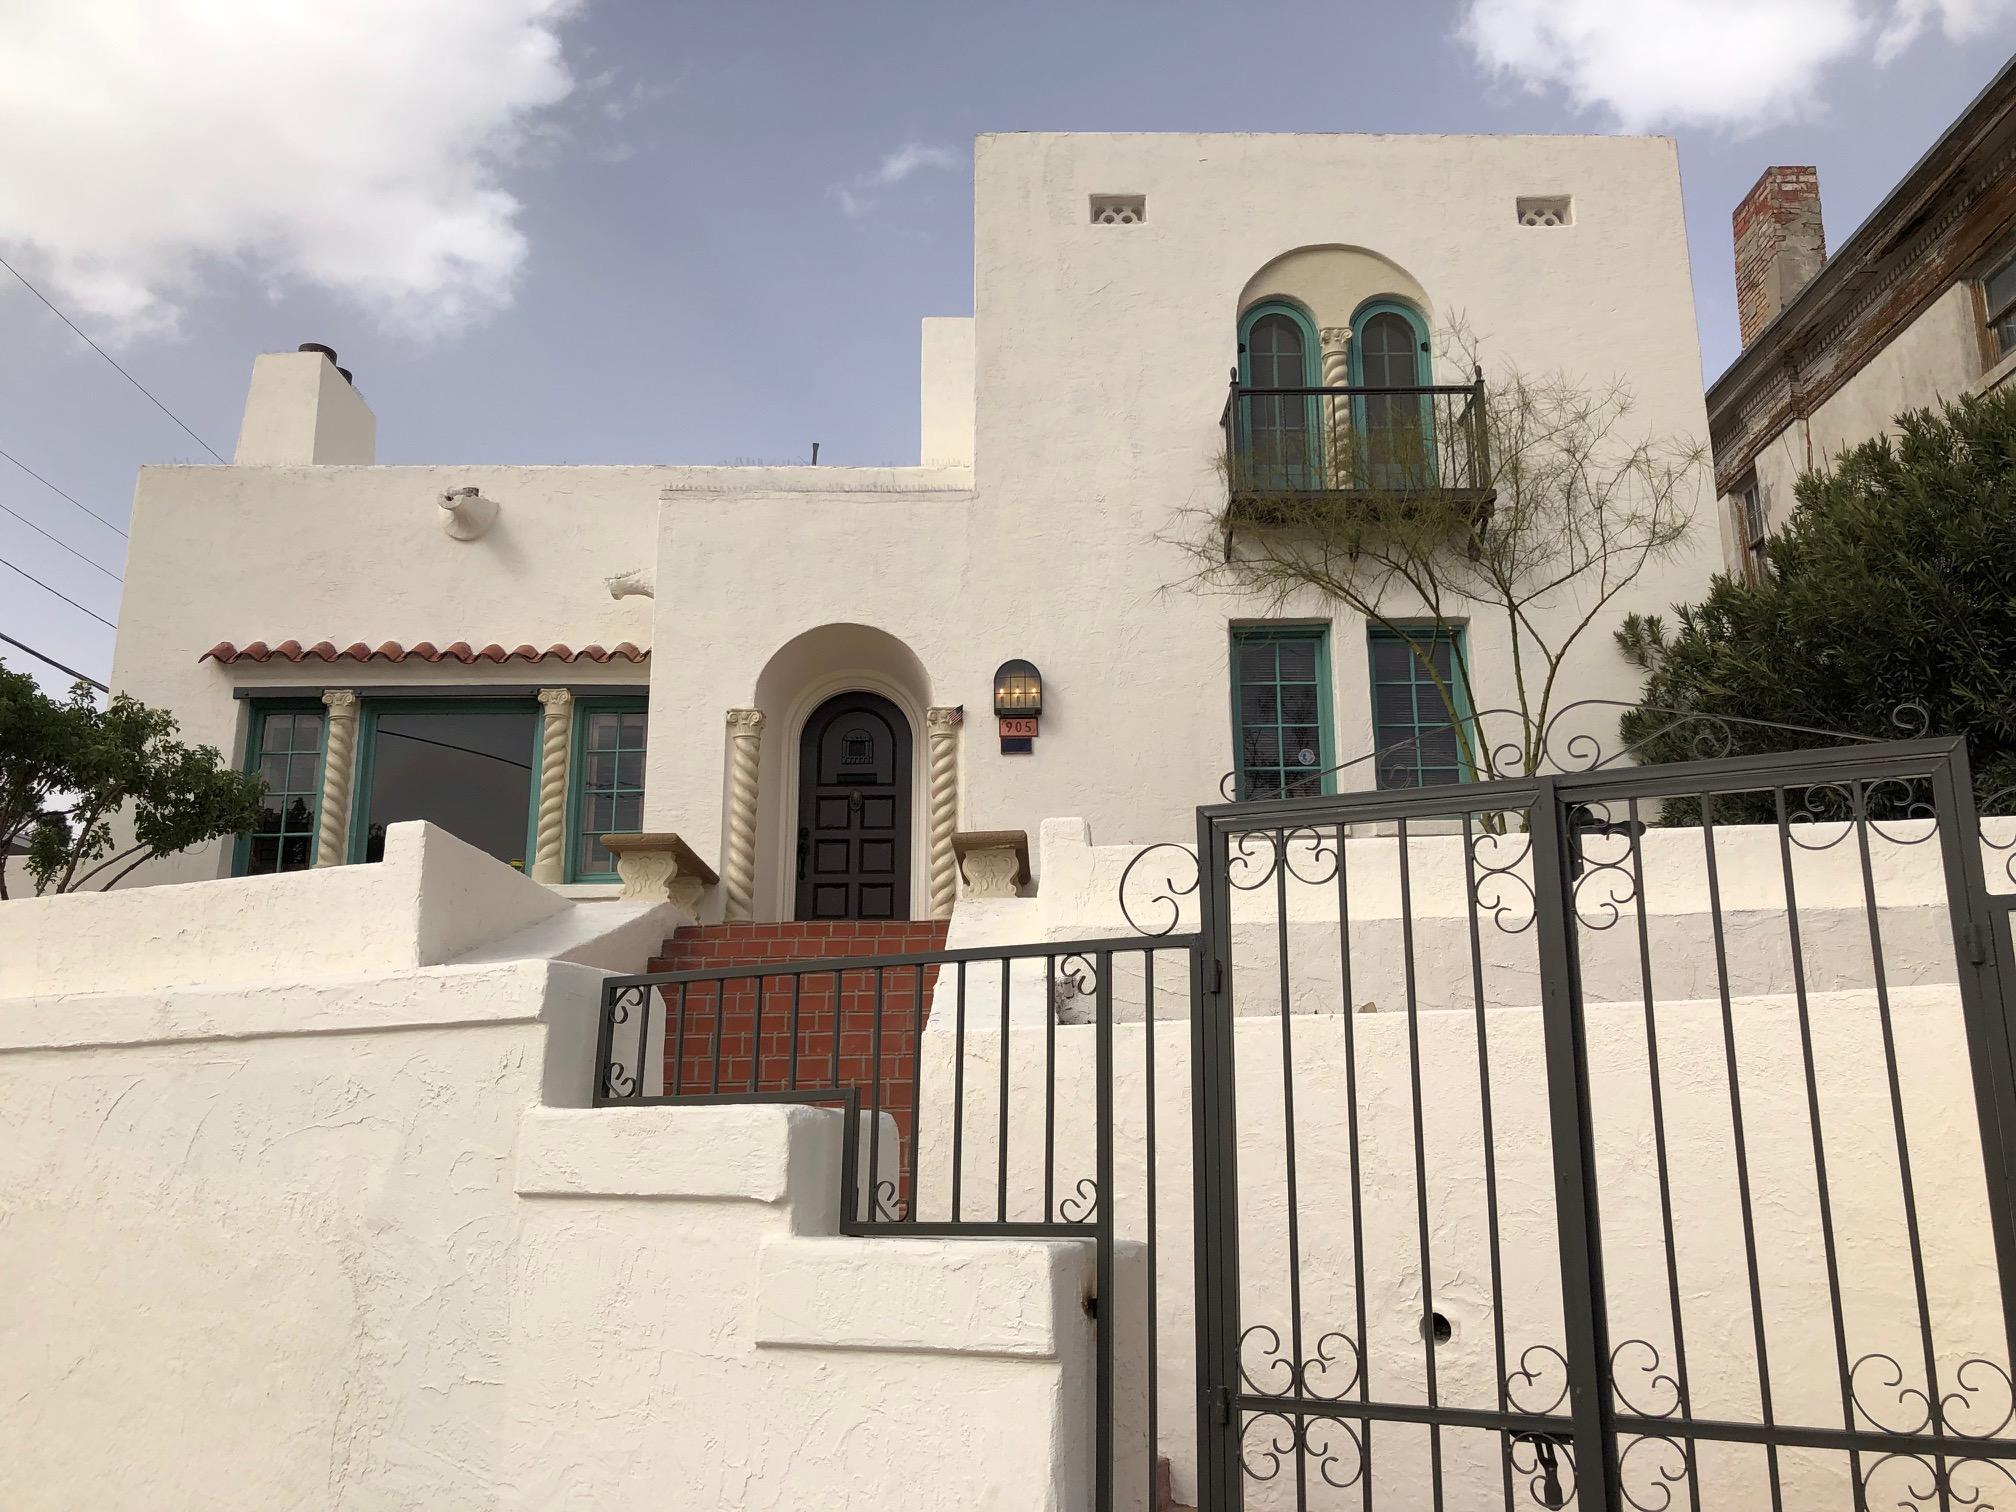 905 Yandell Drive, El Paso, Texas 79902, 3 Bedrooms Bedrooms, ,2 BathroomsBathrooms,Residential Rental,For Rent,Yandell,804022